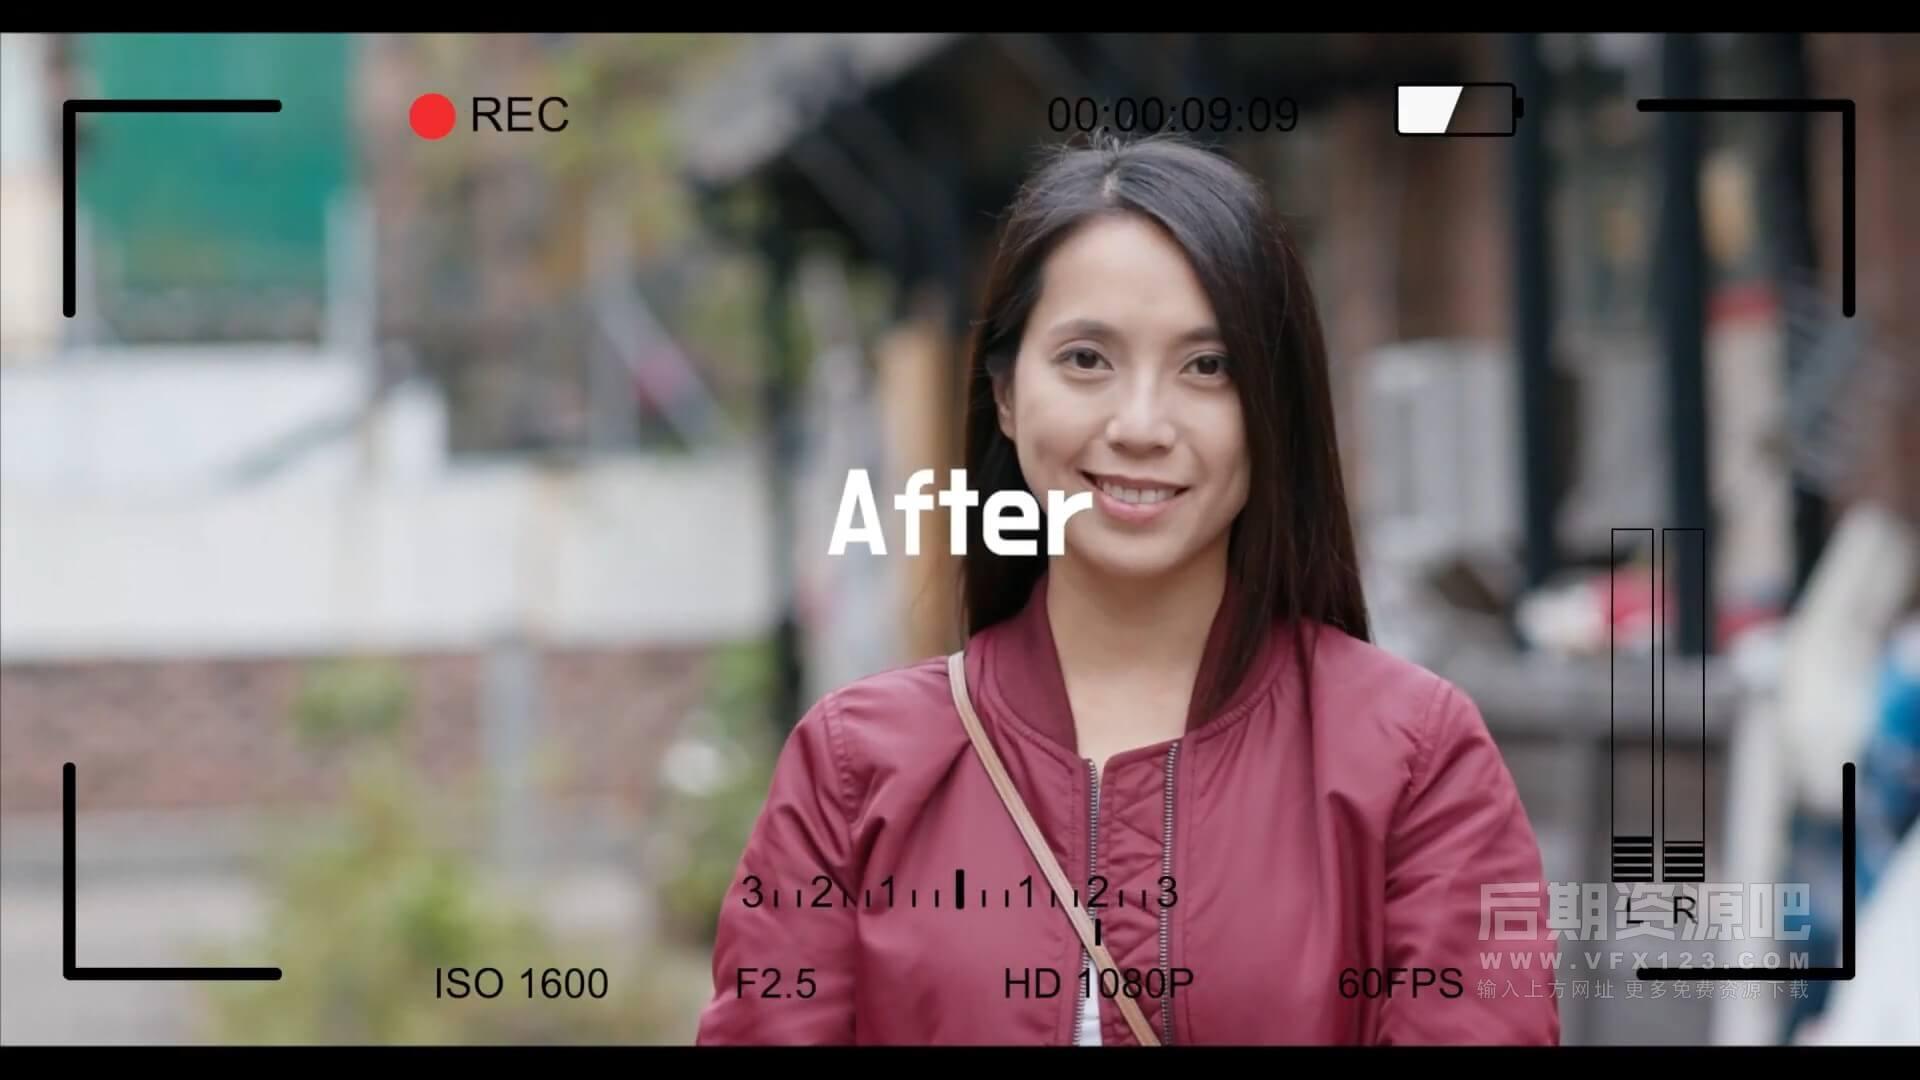 fcpx效果插件 数码相机屏显信息录制状态边框动画 Camera DSLR Motion